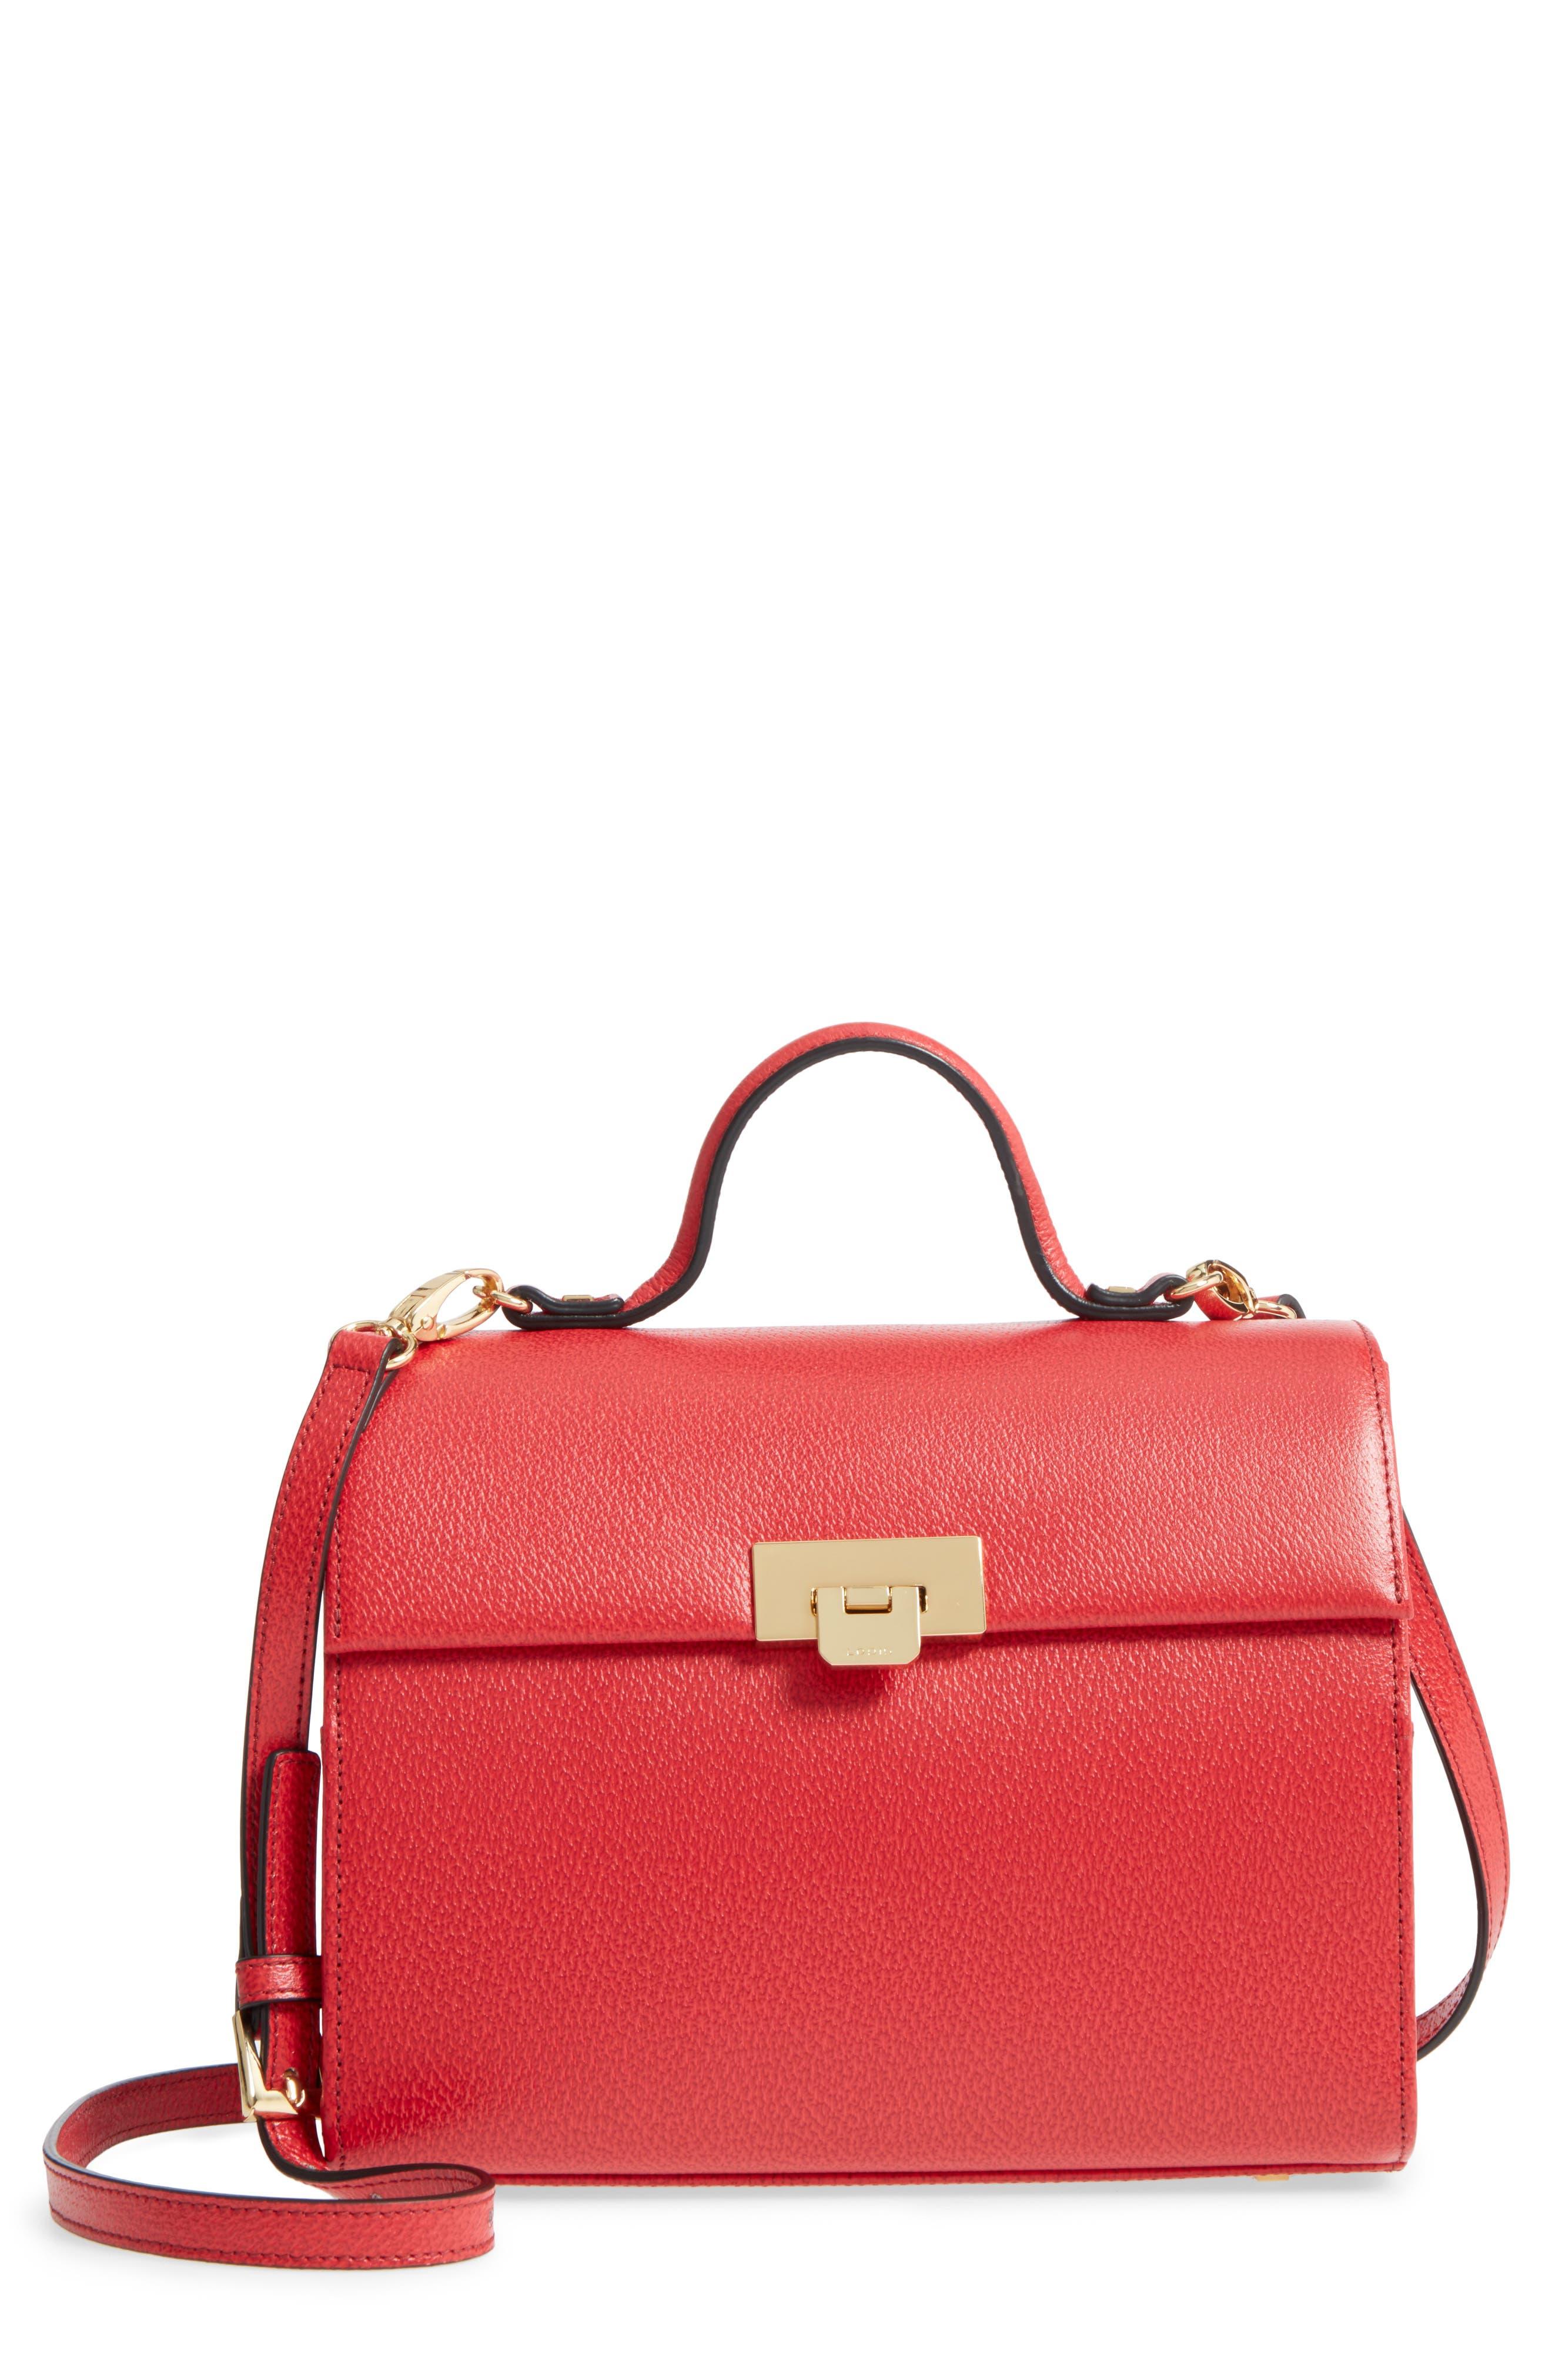 Main Image - LODIS Stephanie Under Lock & Key - Medium Bree Leather Crossbody Bag